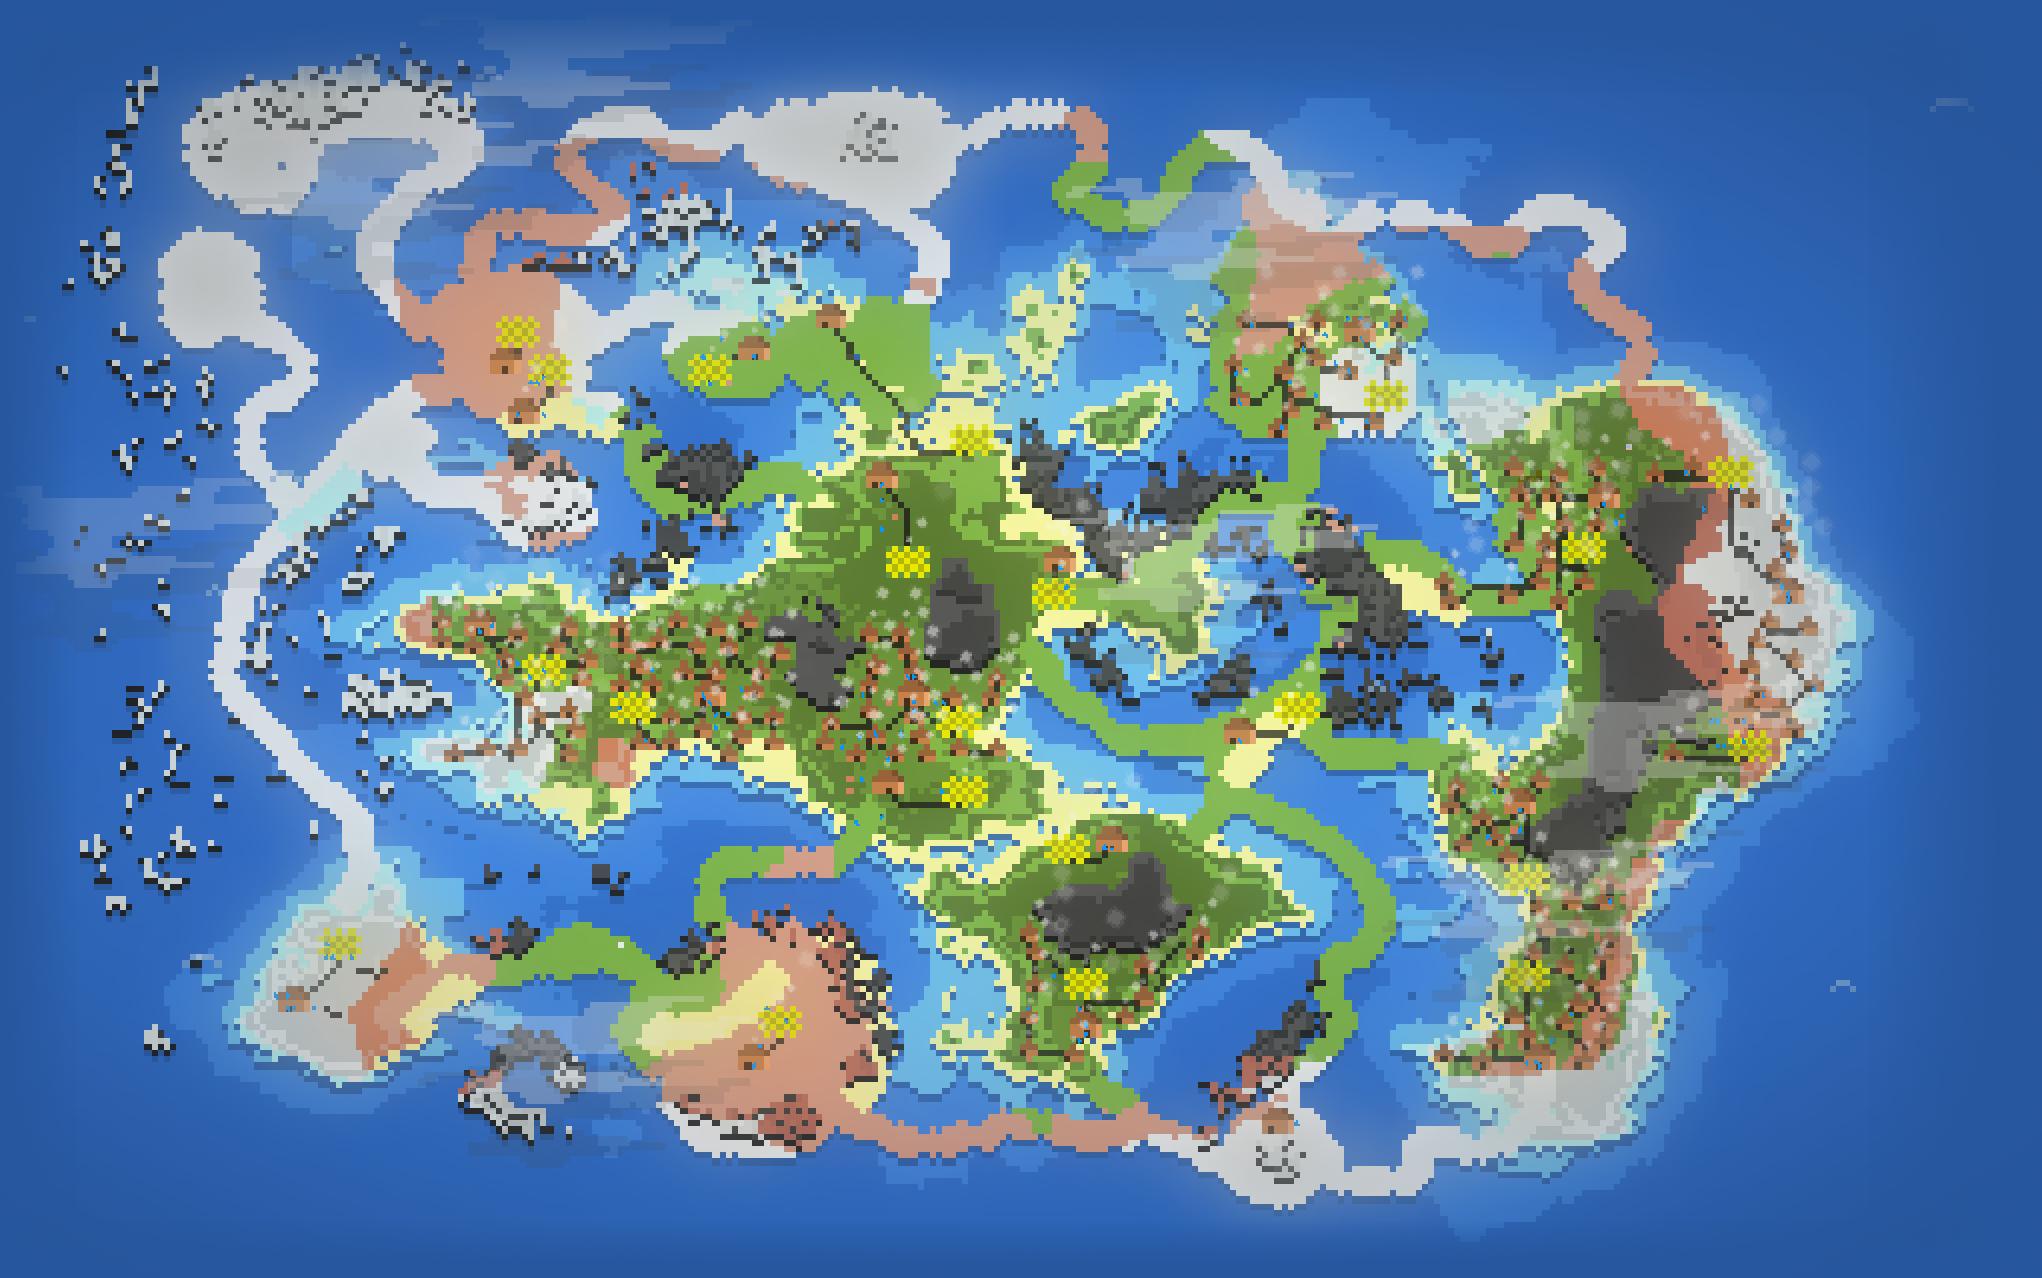 WorldBox:一个隐藏着许多神级玩家的上帝模拟游戏